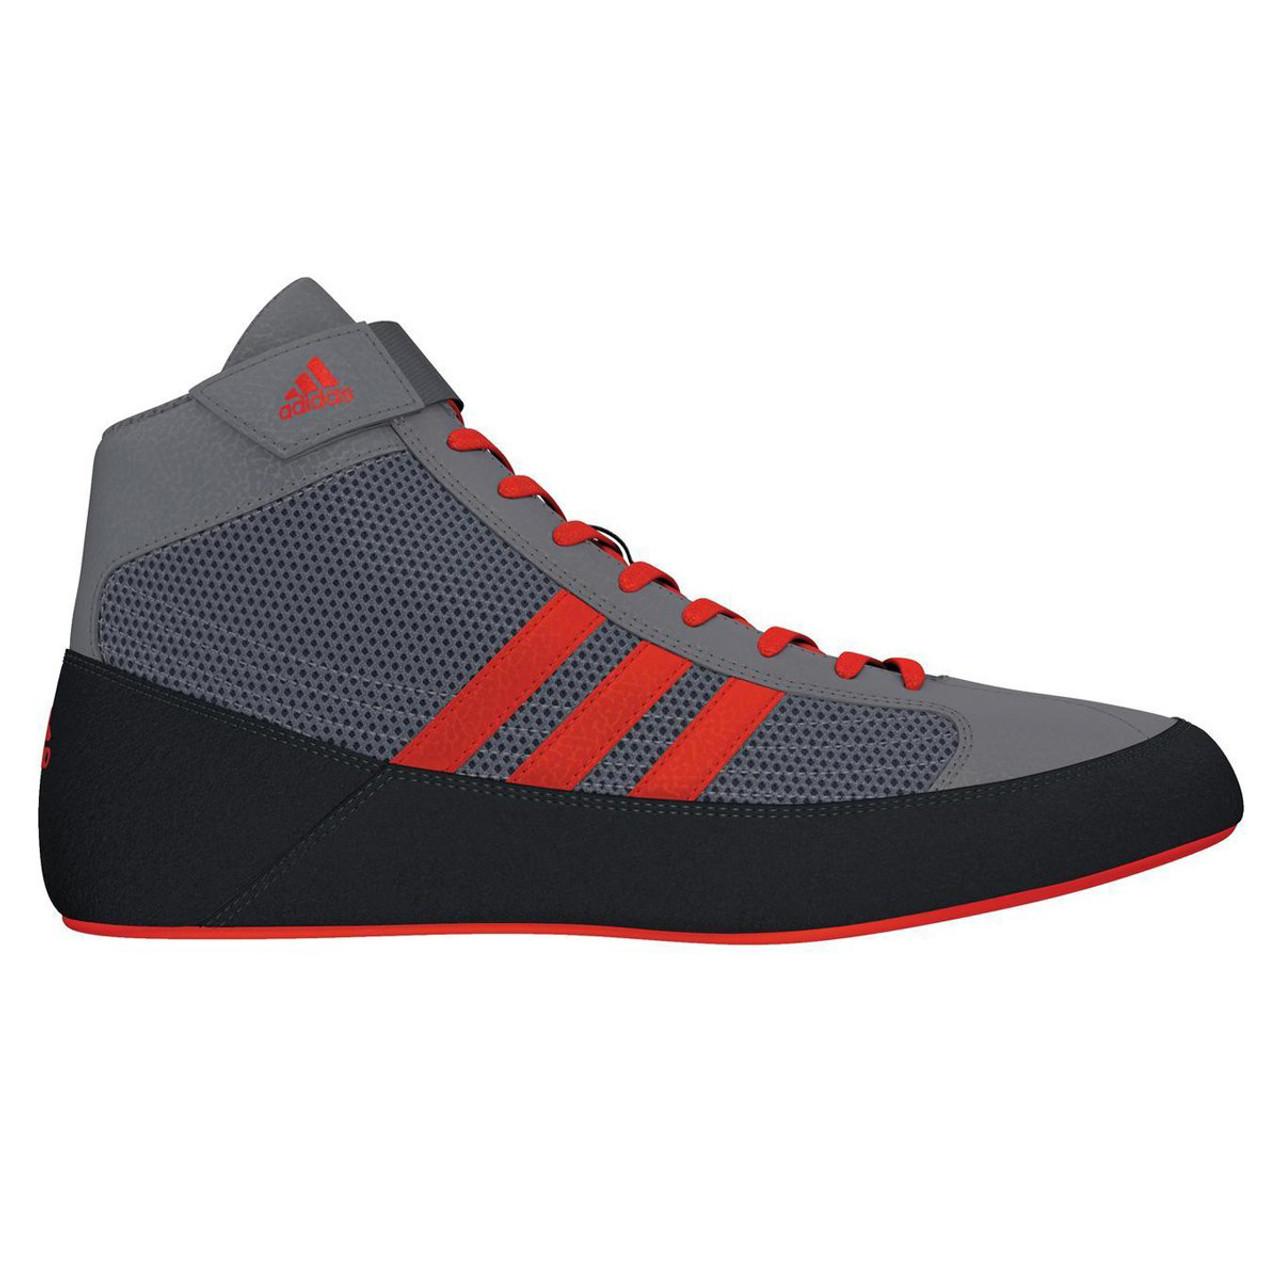 reputable site 549a4 6f6b1 Adidas HVC 2 Mens Wrestling Shoes CG3802 - Grey   Solar Red ...